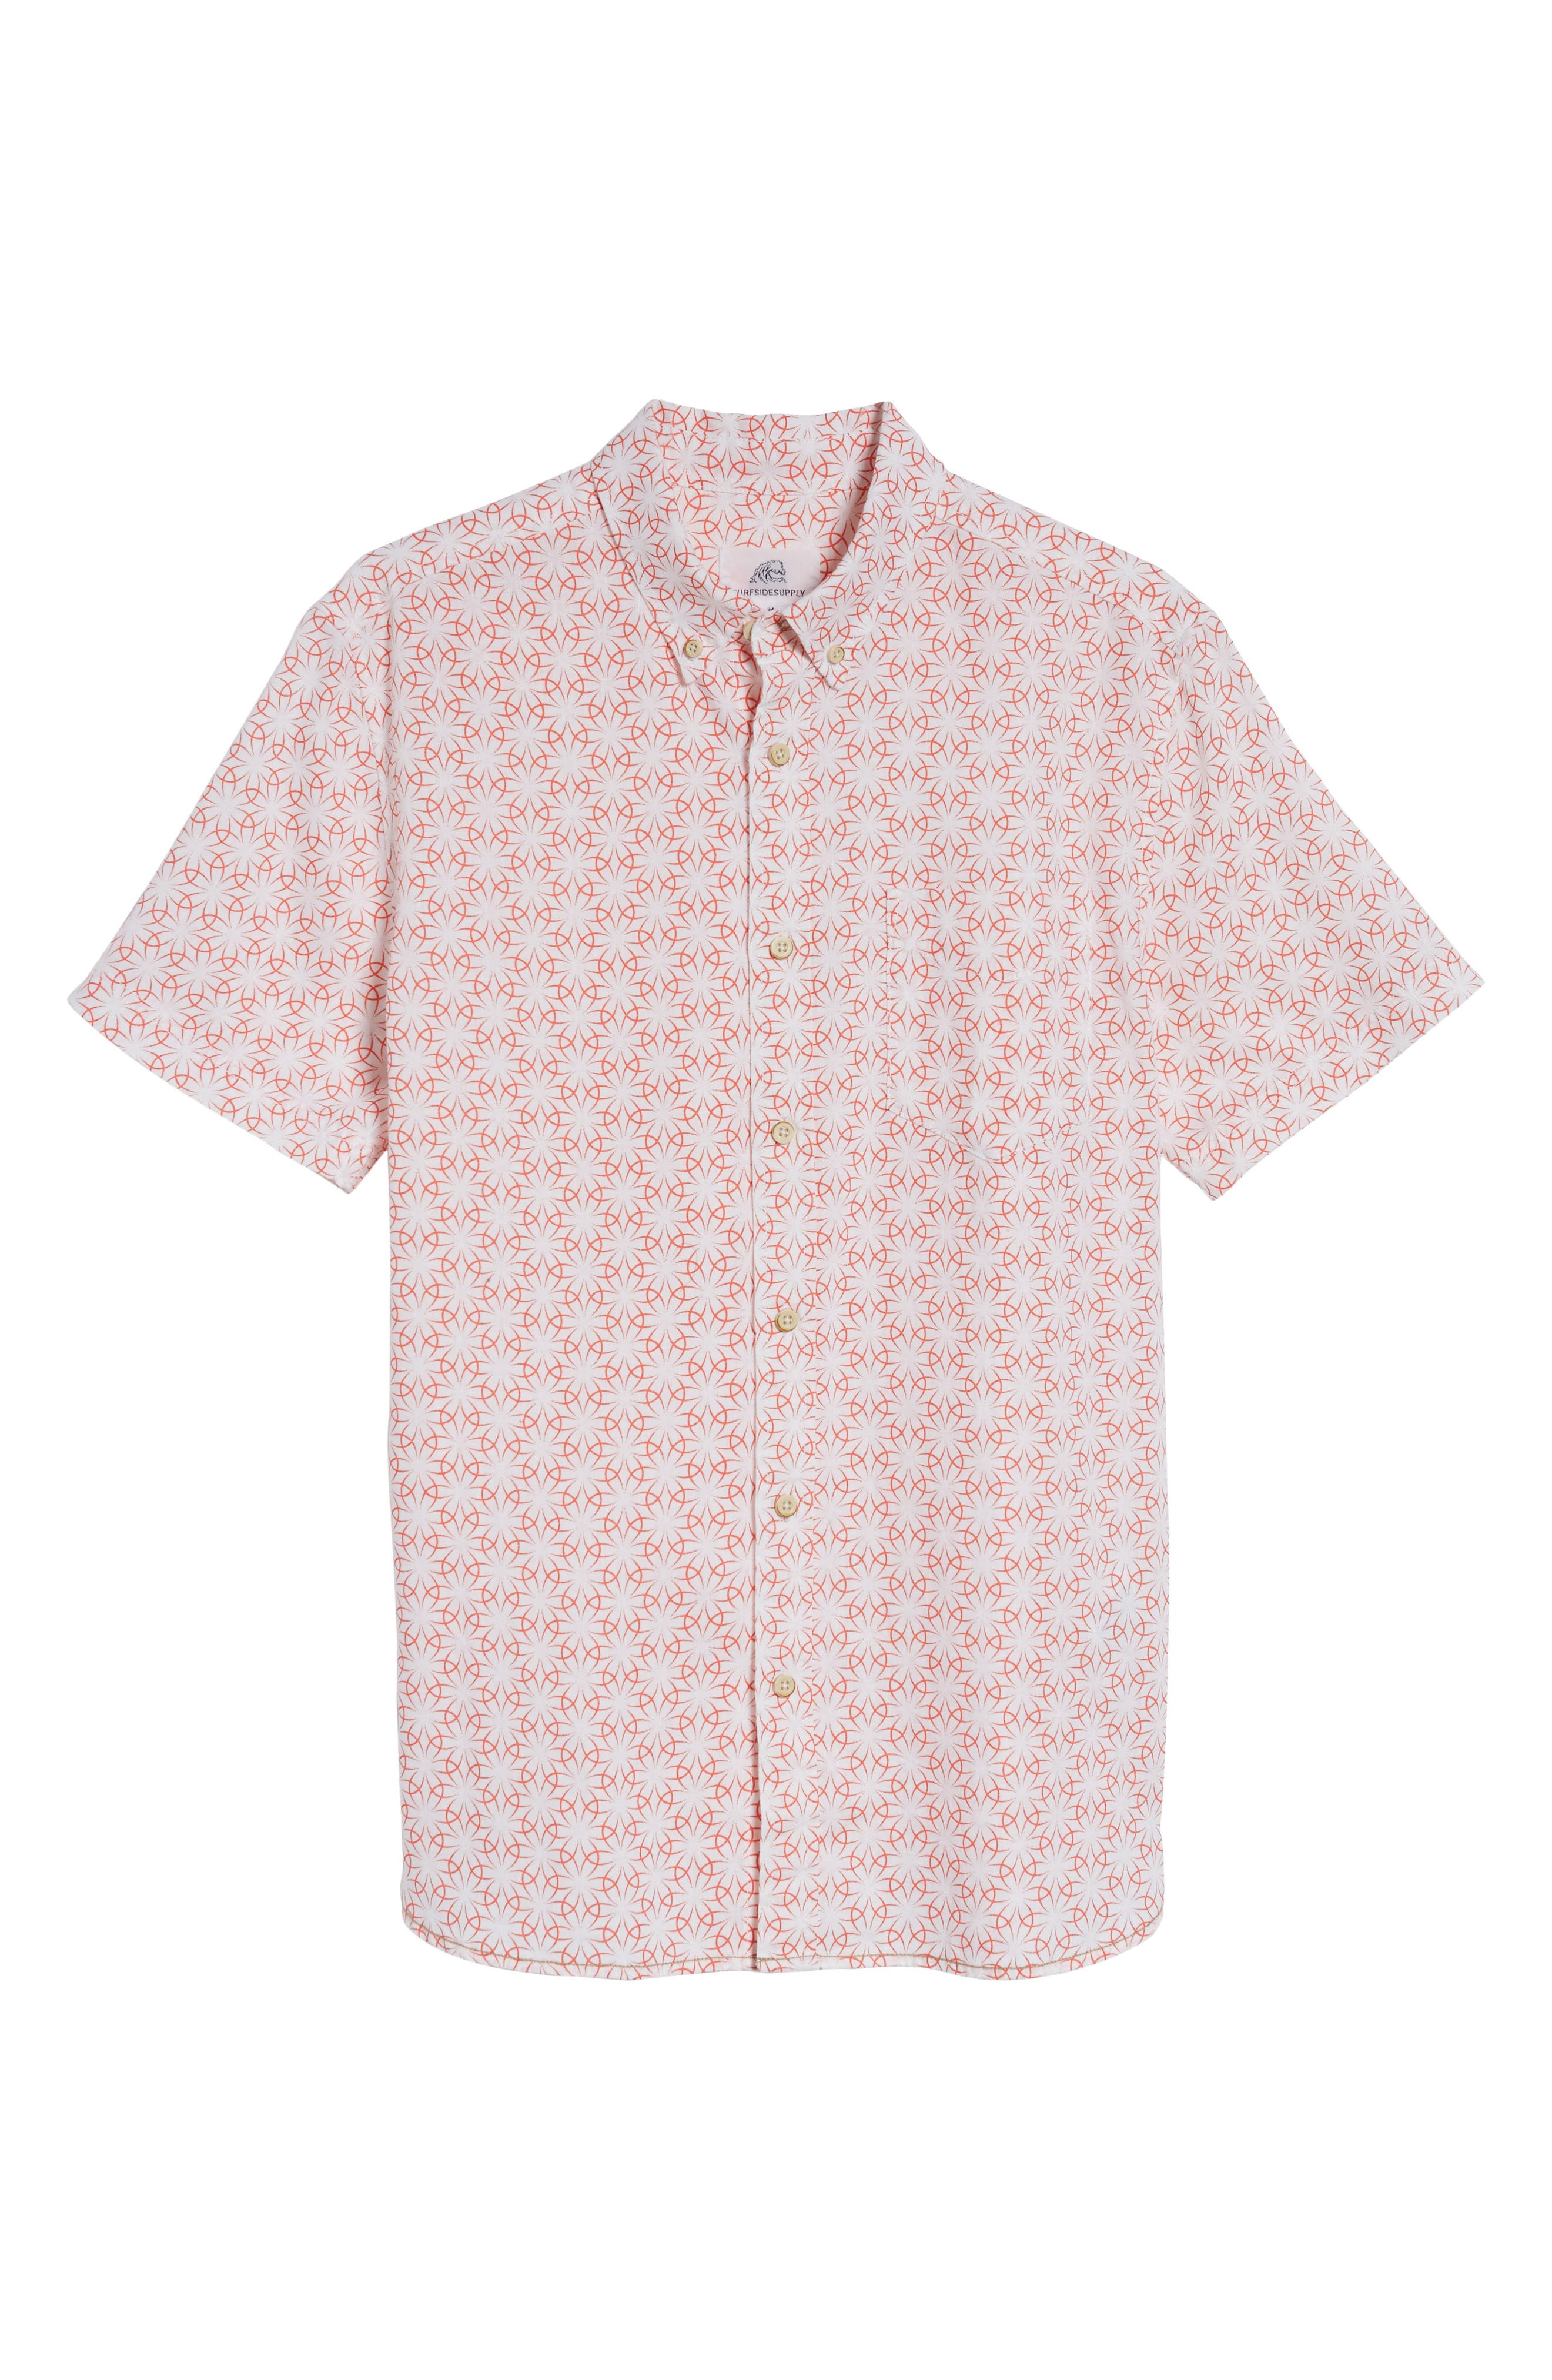 Gradient Flower Linen Sport Shirt,                             Alternate thumbnail 6, color,                             White/ Coral